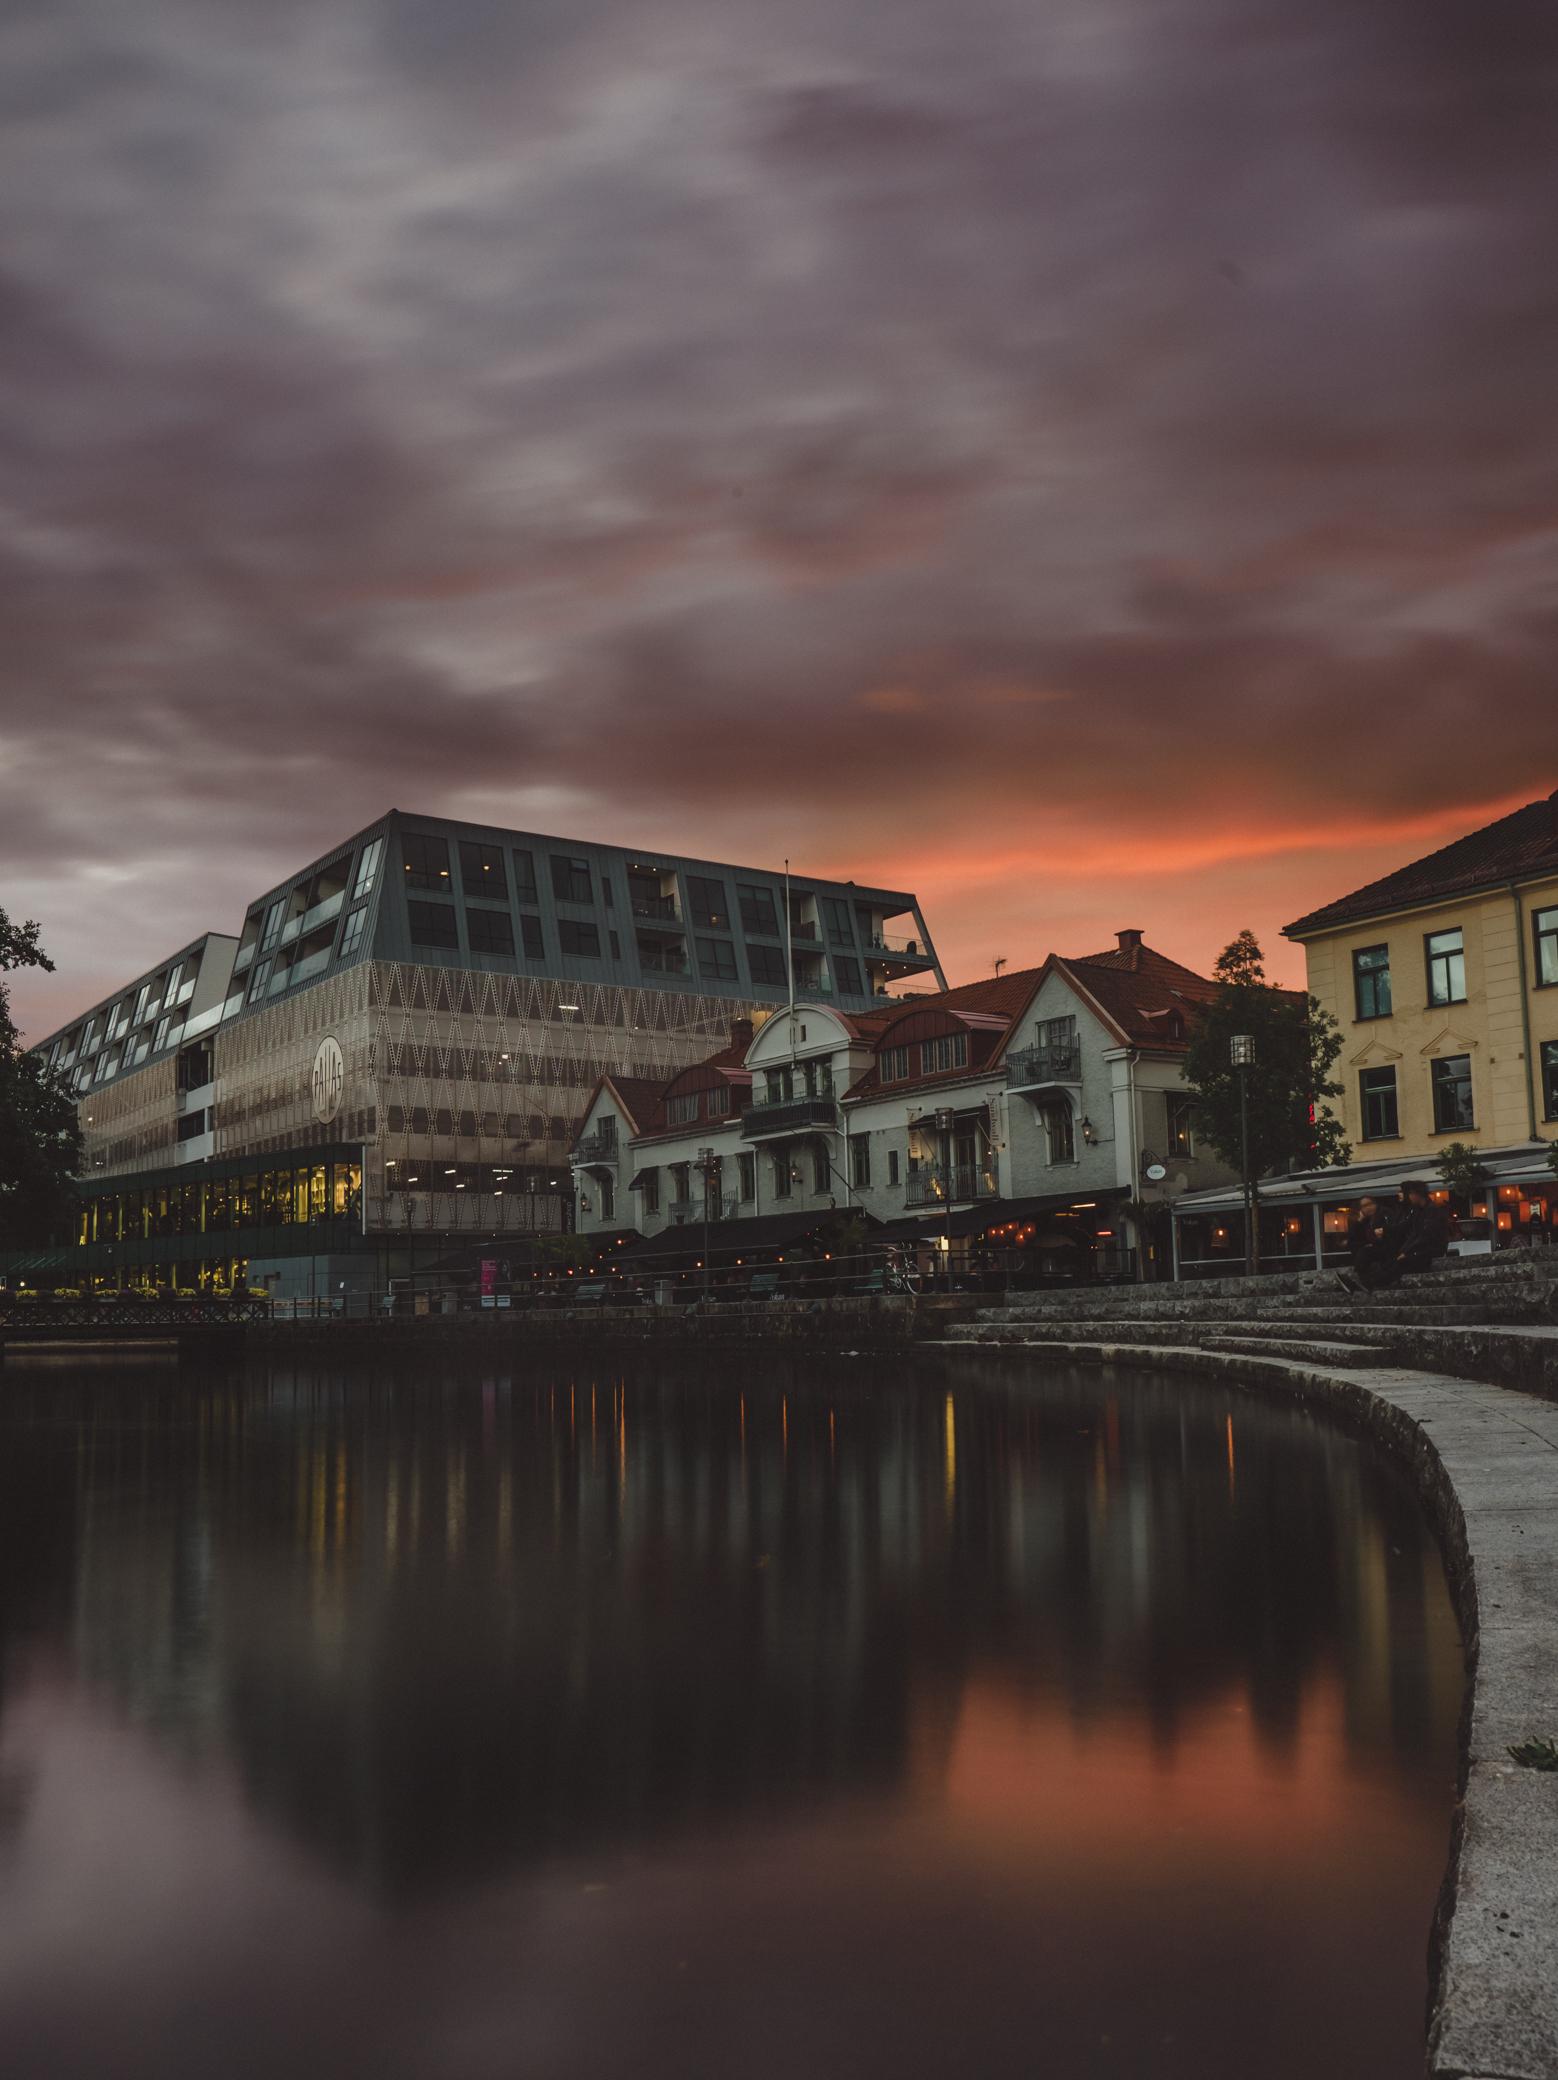 stadsfoto_borås_fotograf_max_norin-3.jpg